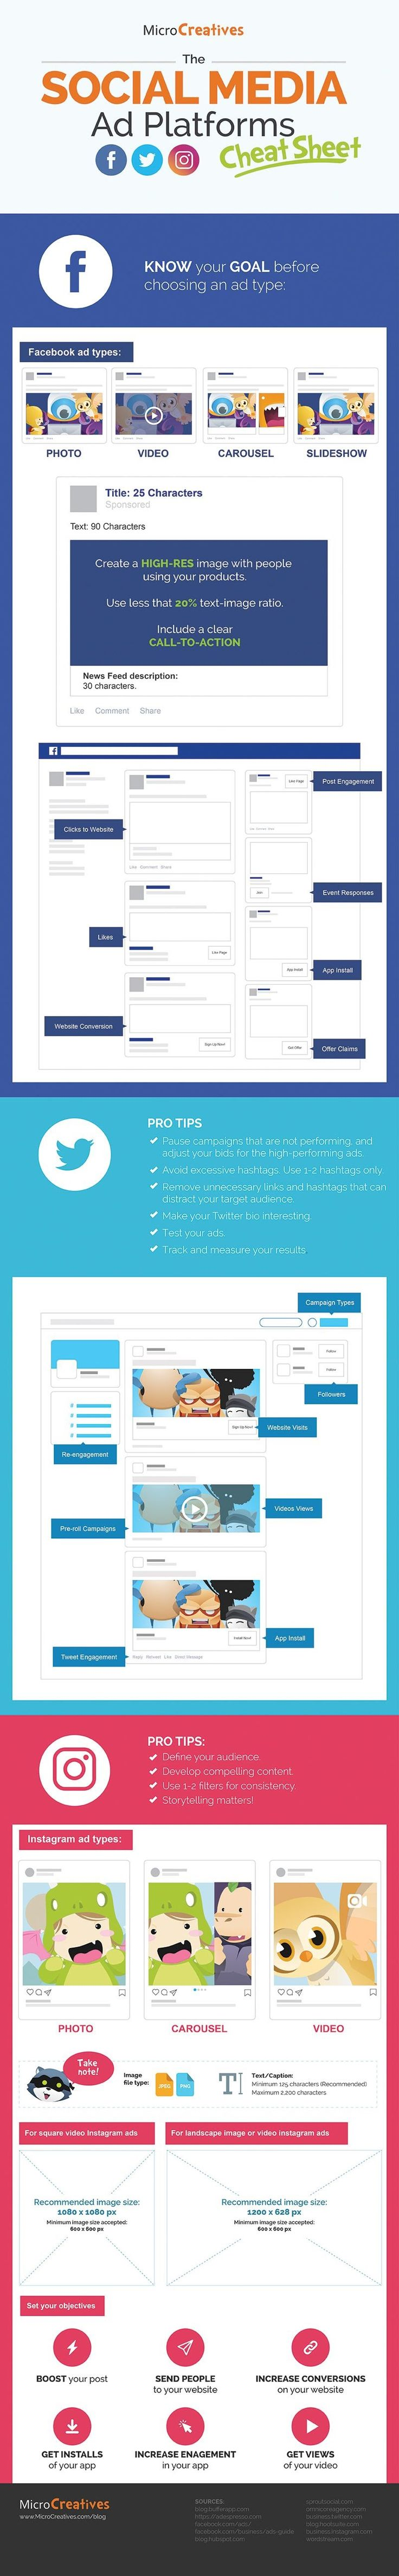 Social Media Ad Platforms Cheat Sheet [Infographic] | Social Media Today